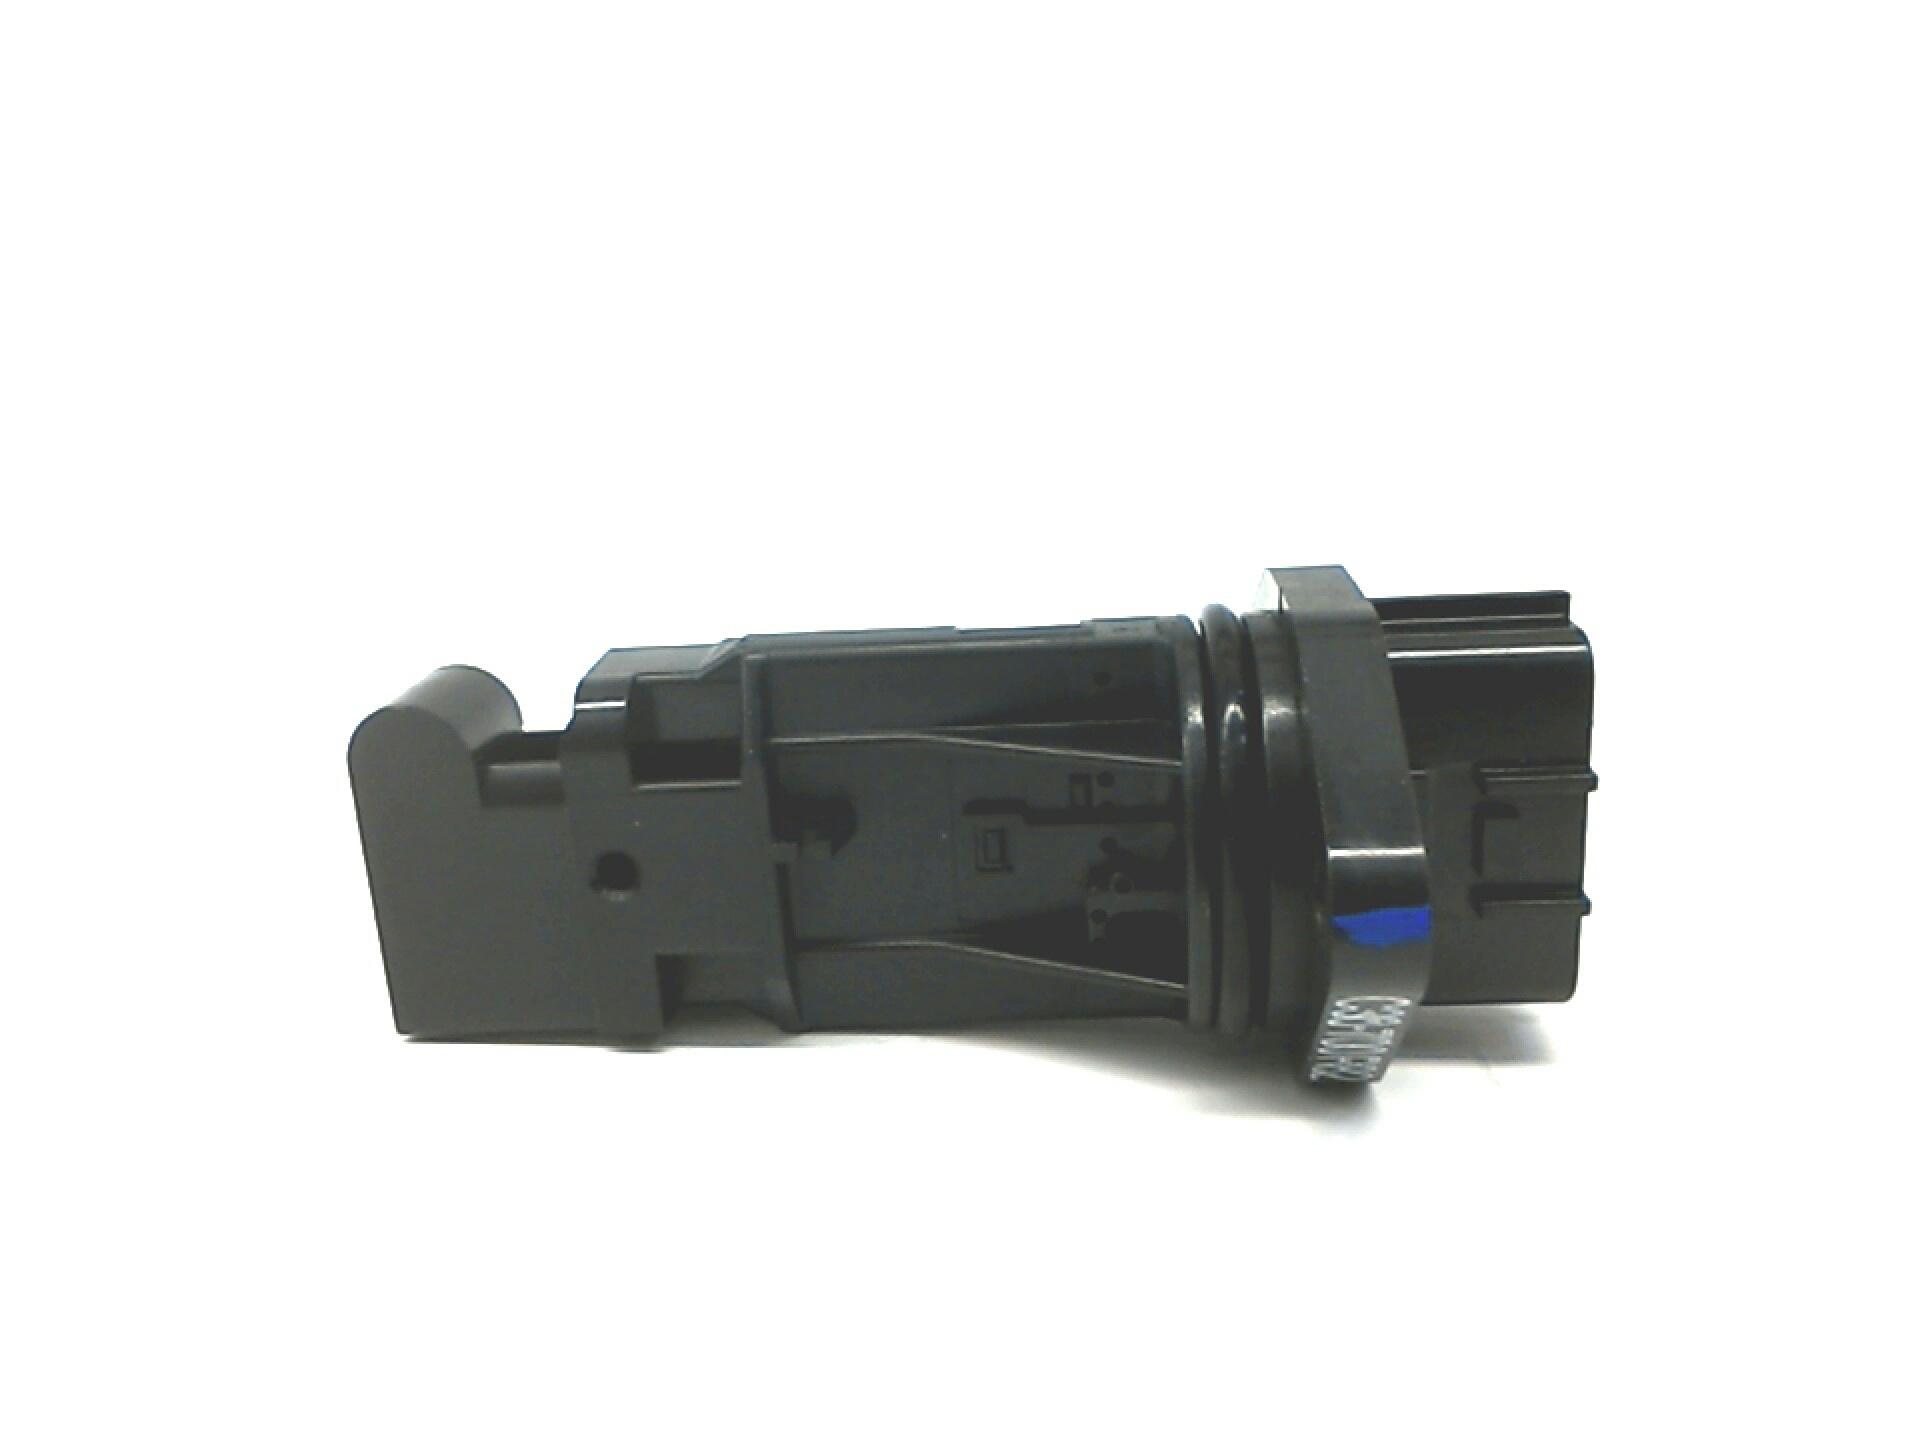 Diagram Subaru Heater Core Replacement Subaru Impreza Wiring Diagram